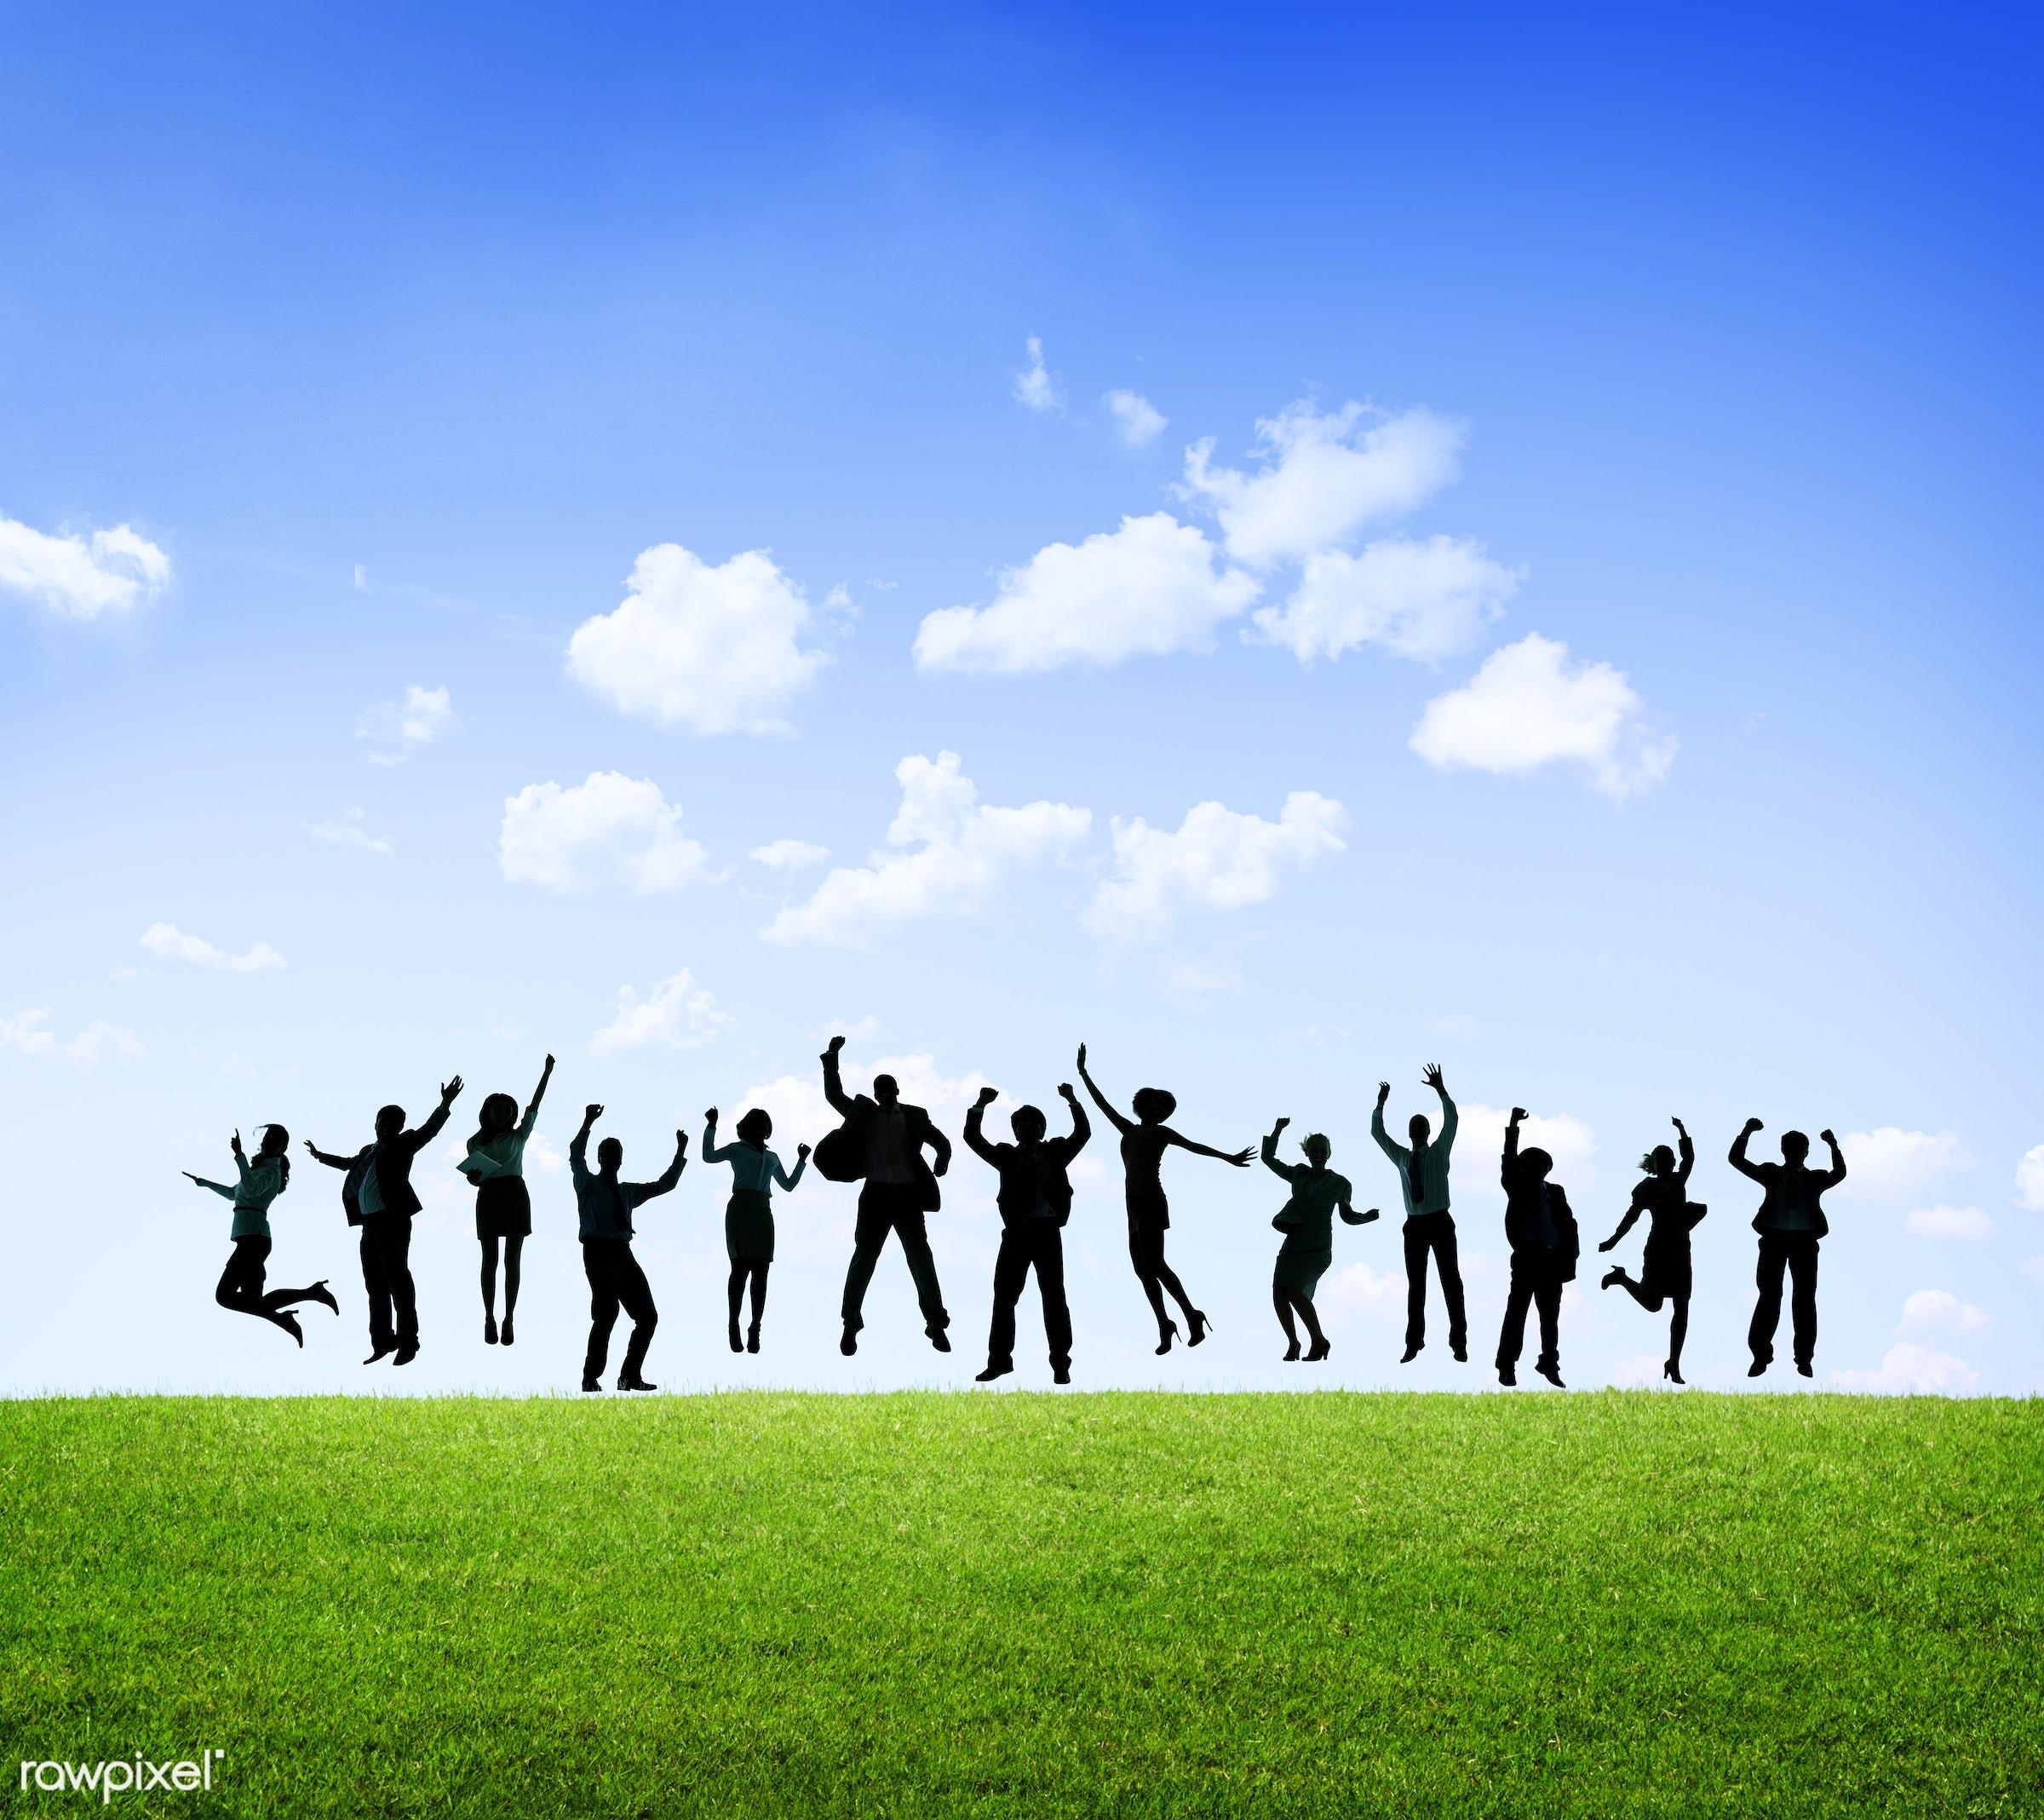 achievement, arms raised, aspiration, blank, business, business people, businessmen, businesswomen, celebrating, celebration...